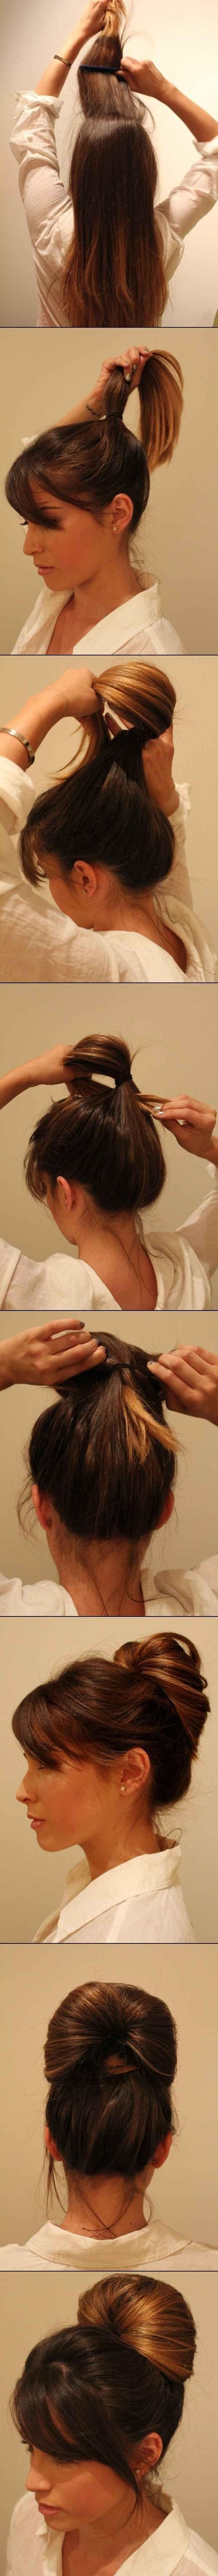 Hochzeit - 26 Lazy Girl Hairstyling Hacks